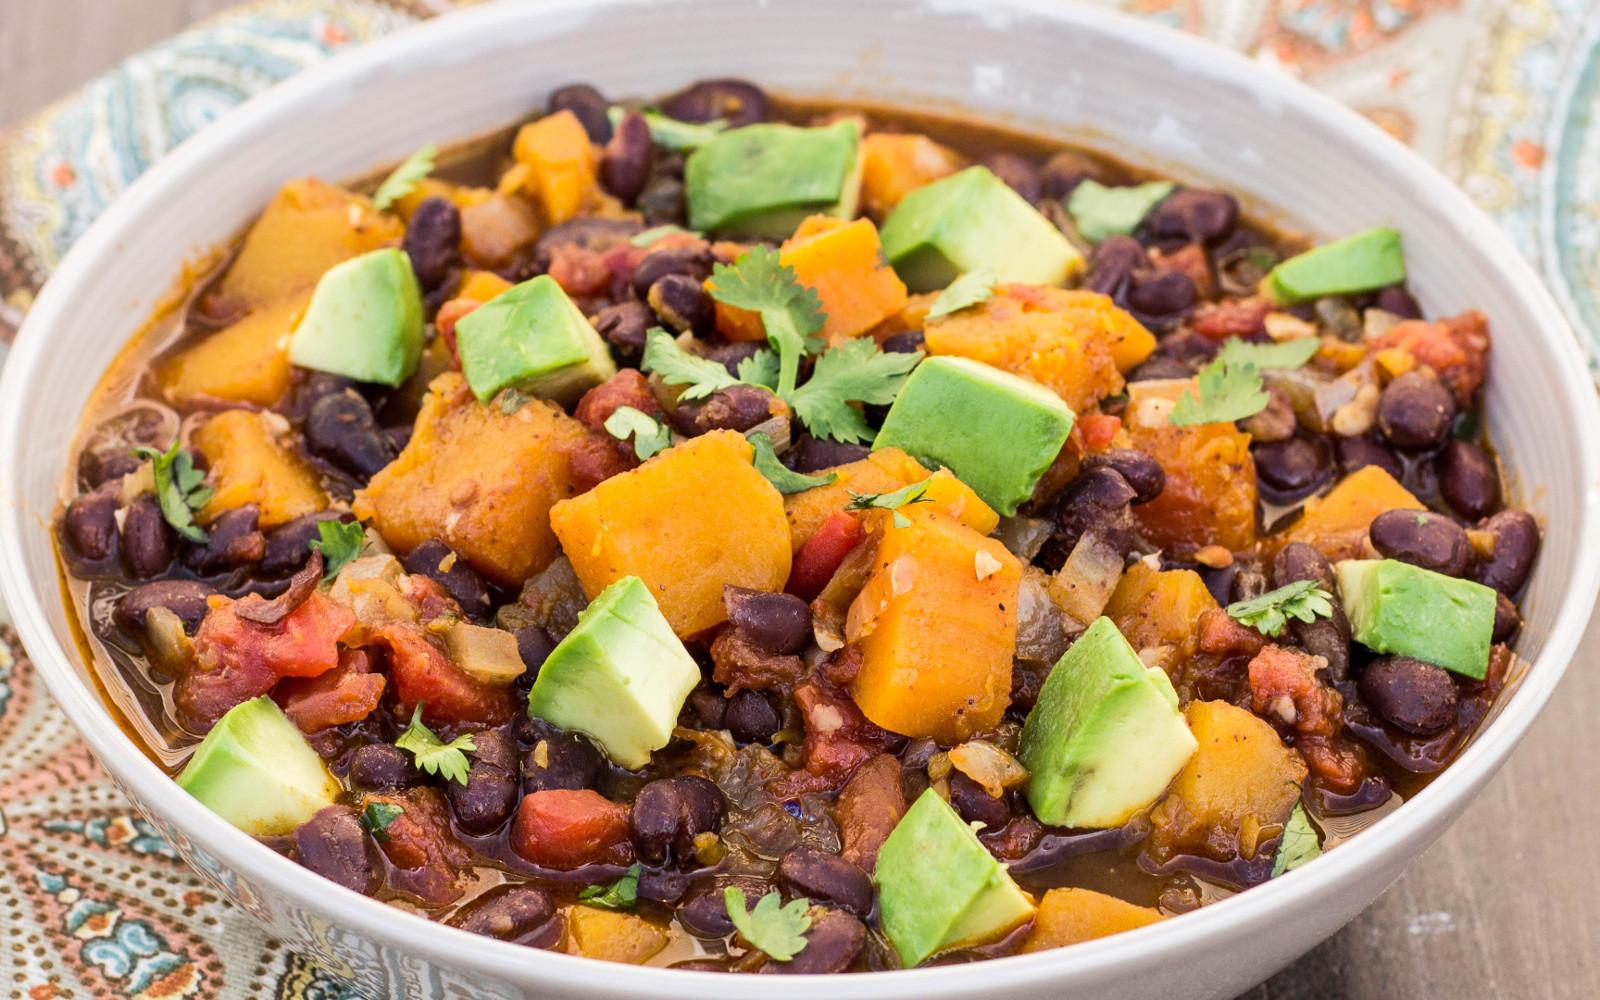 Vegan gluten-free Butternut Squash and Black Bean Chili